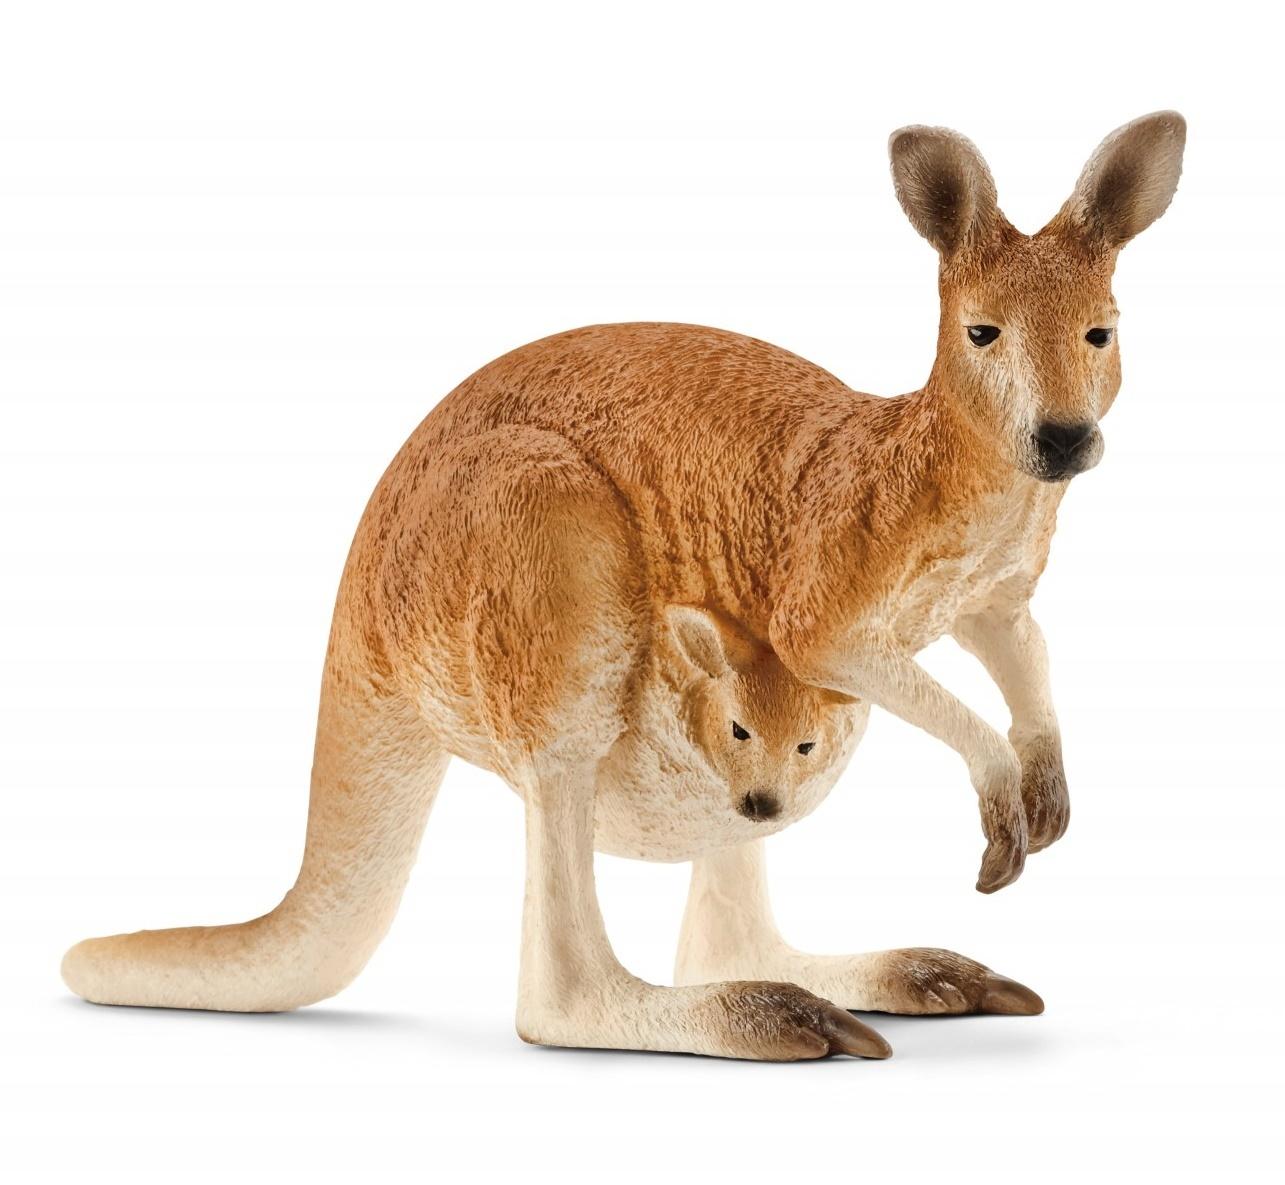 Schleich: Kangaroo image